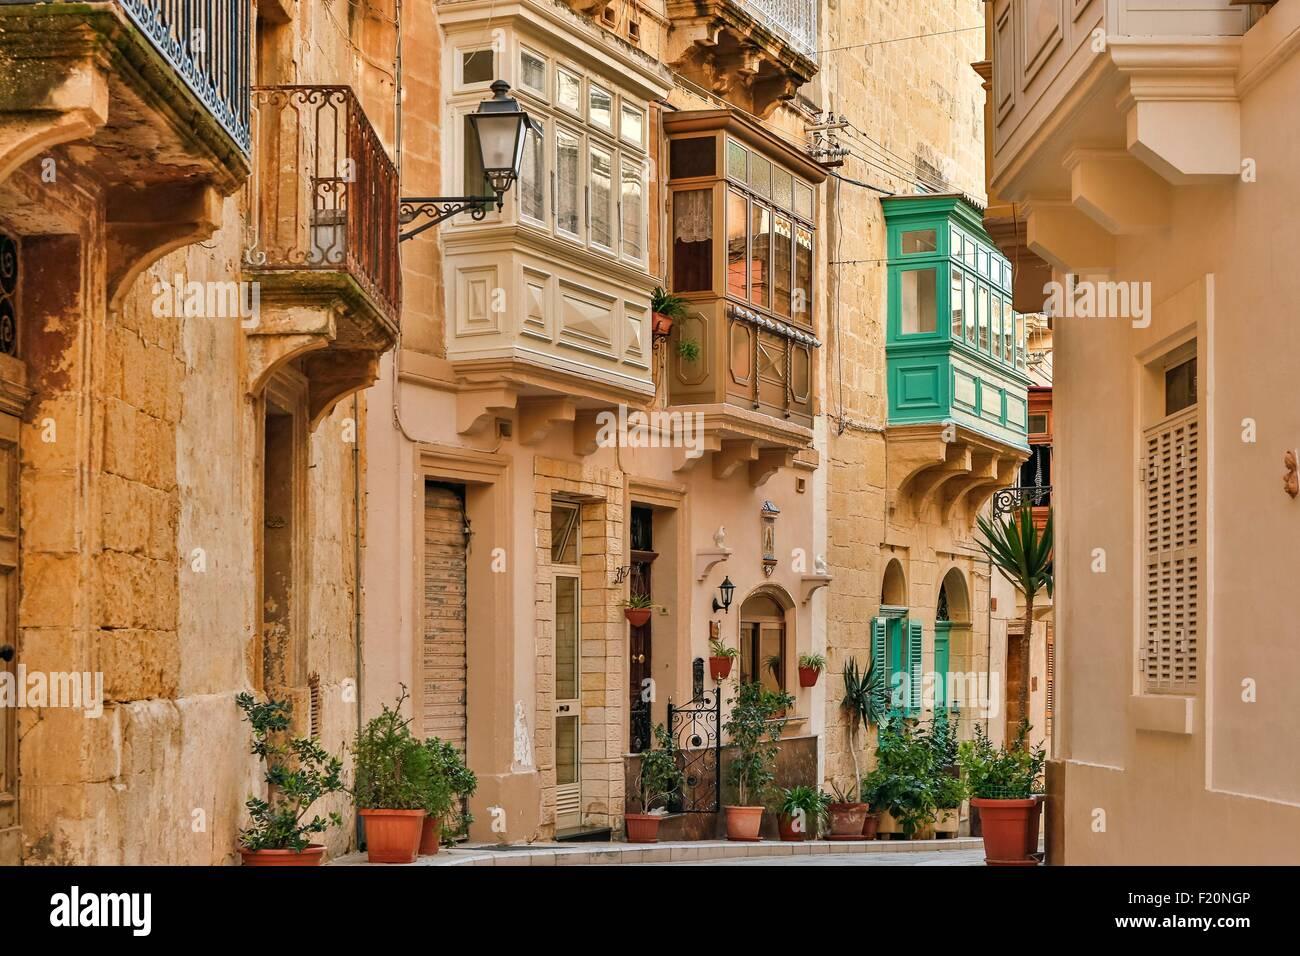 Malta, Birgu, Vittoriosa, narrow alley composed of old